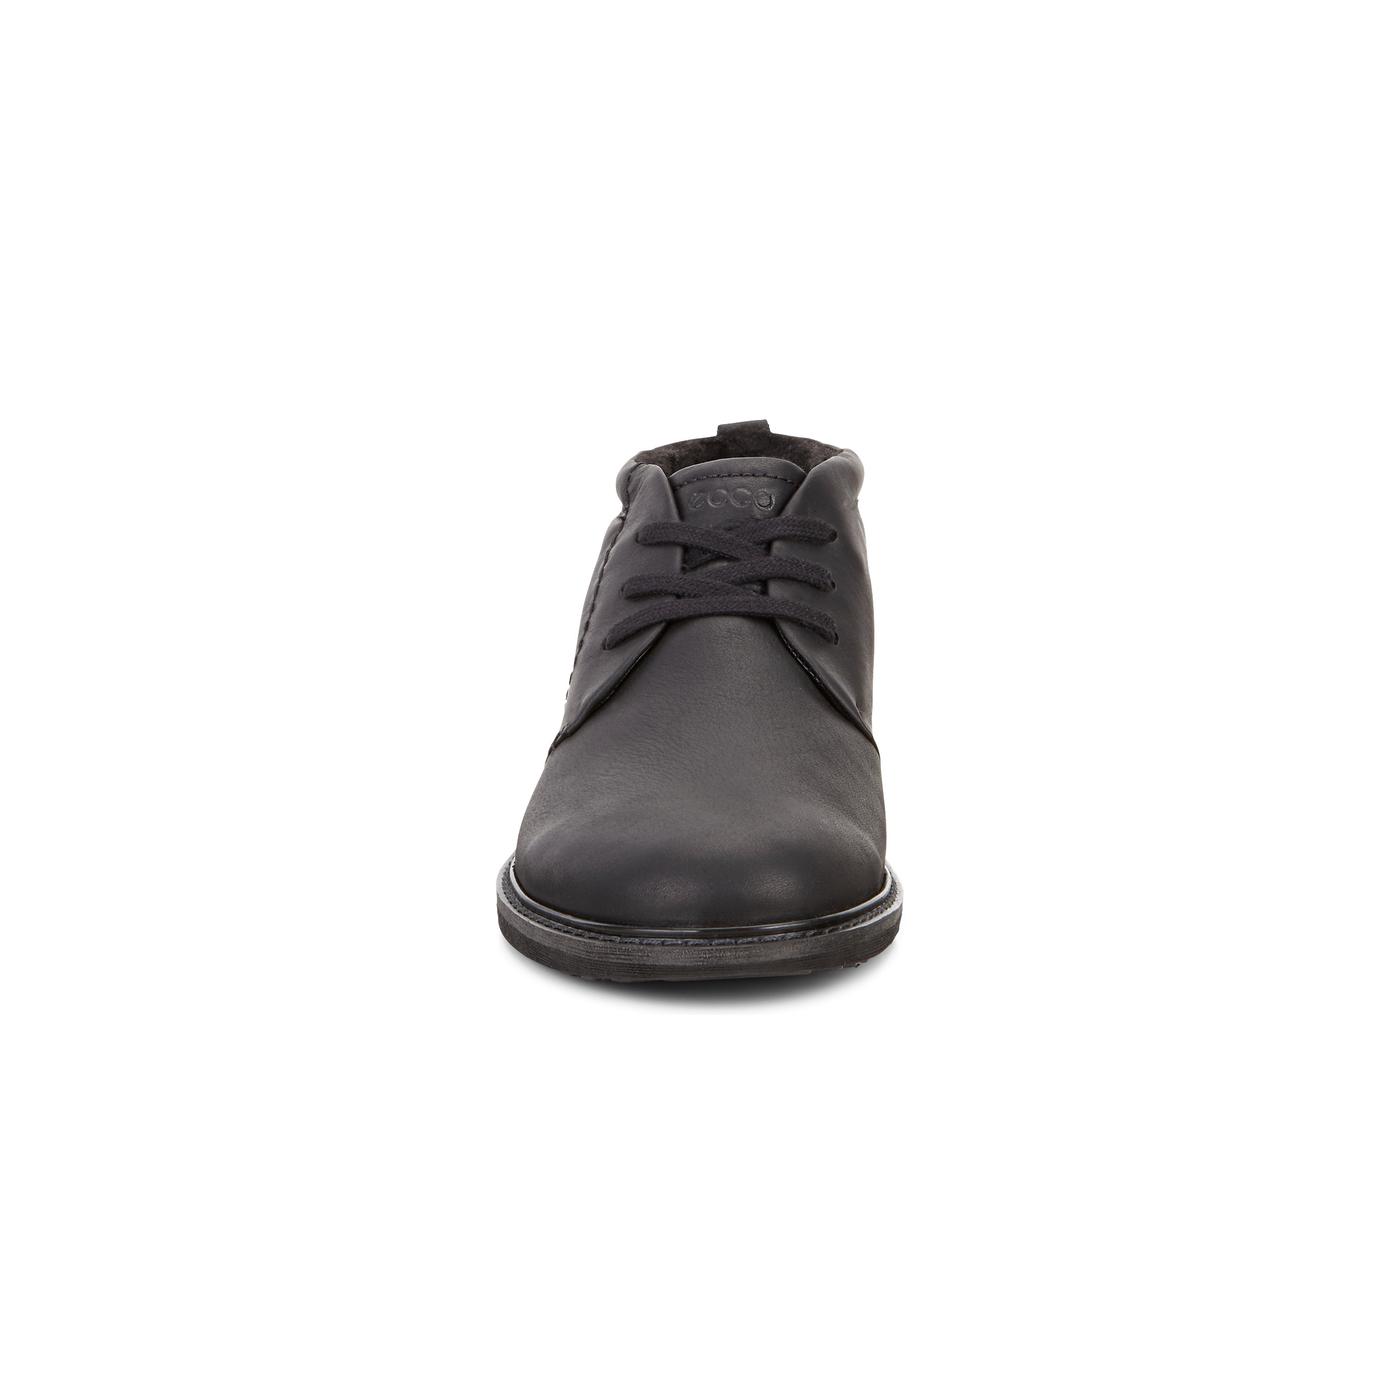 ECCO Turn GTX Lace Boot